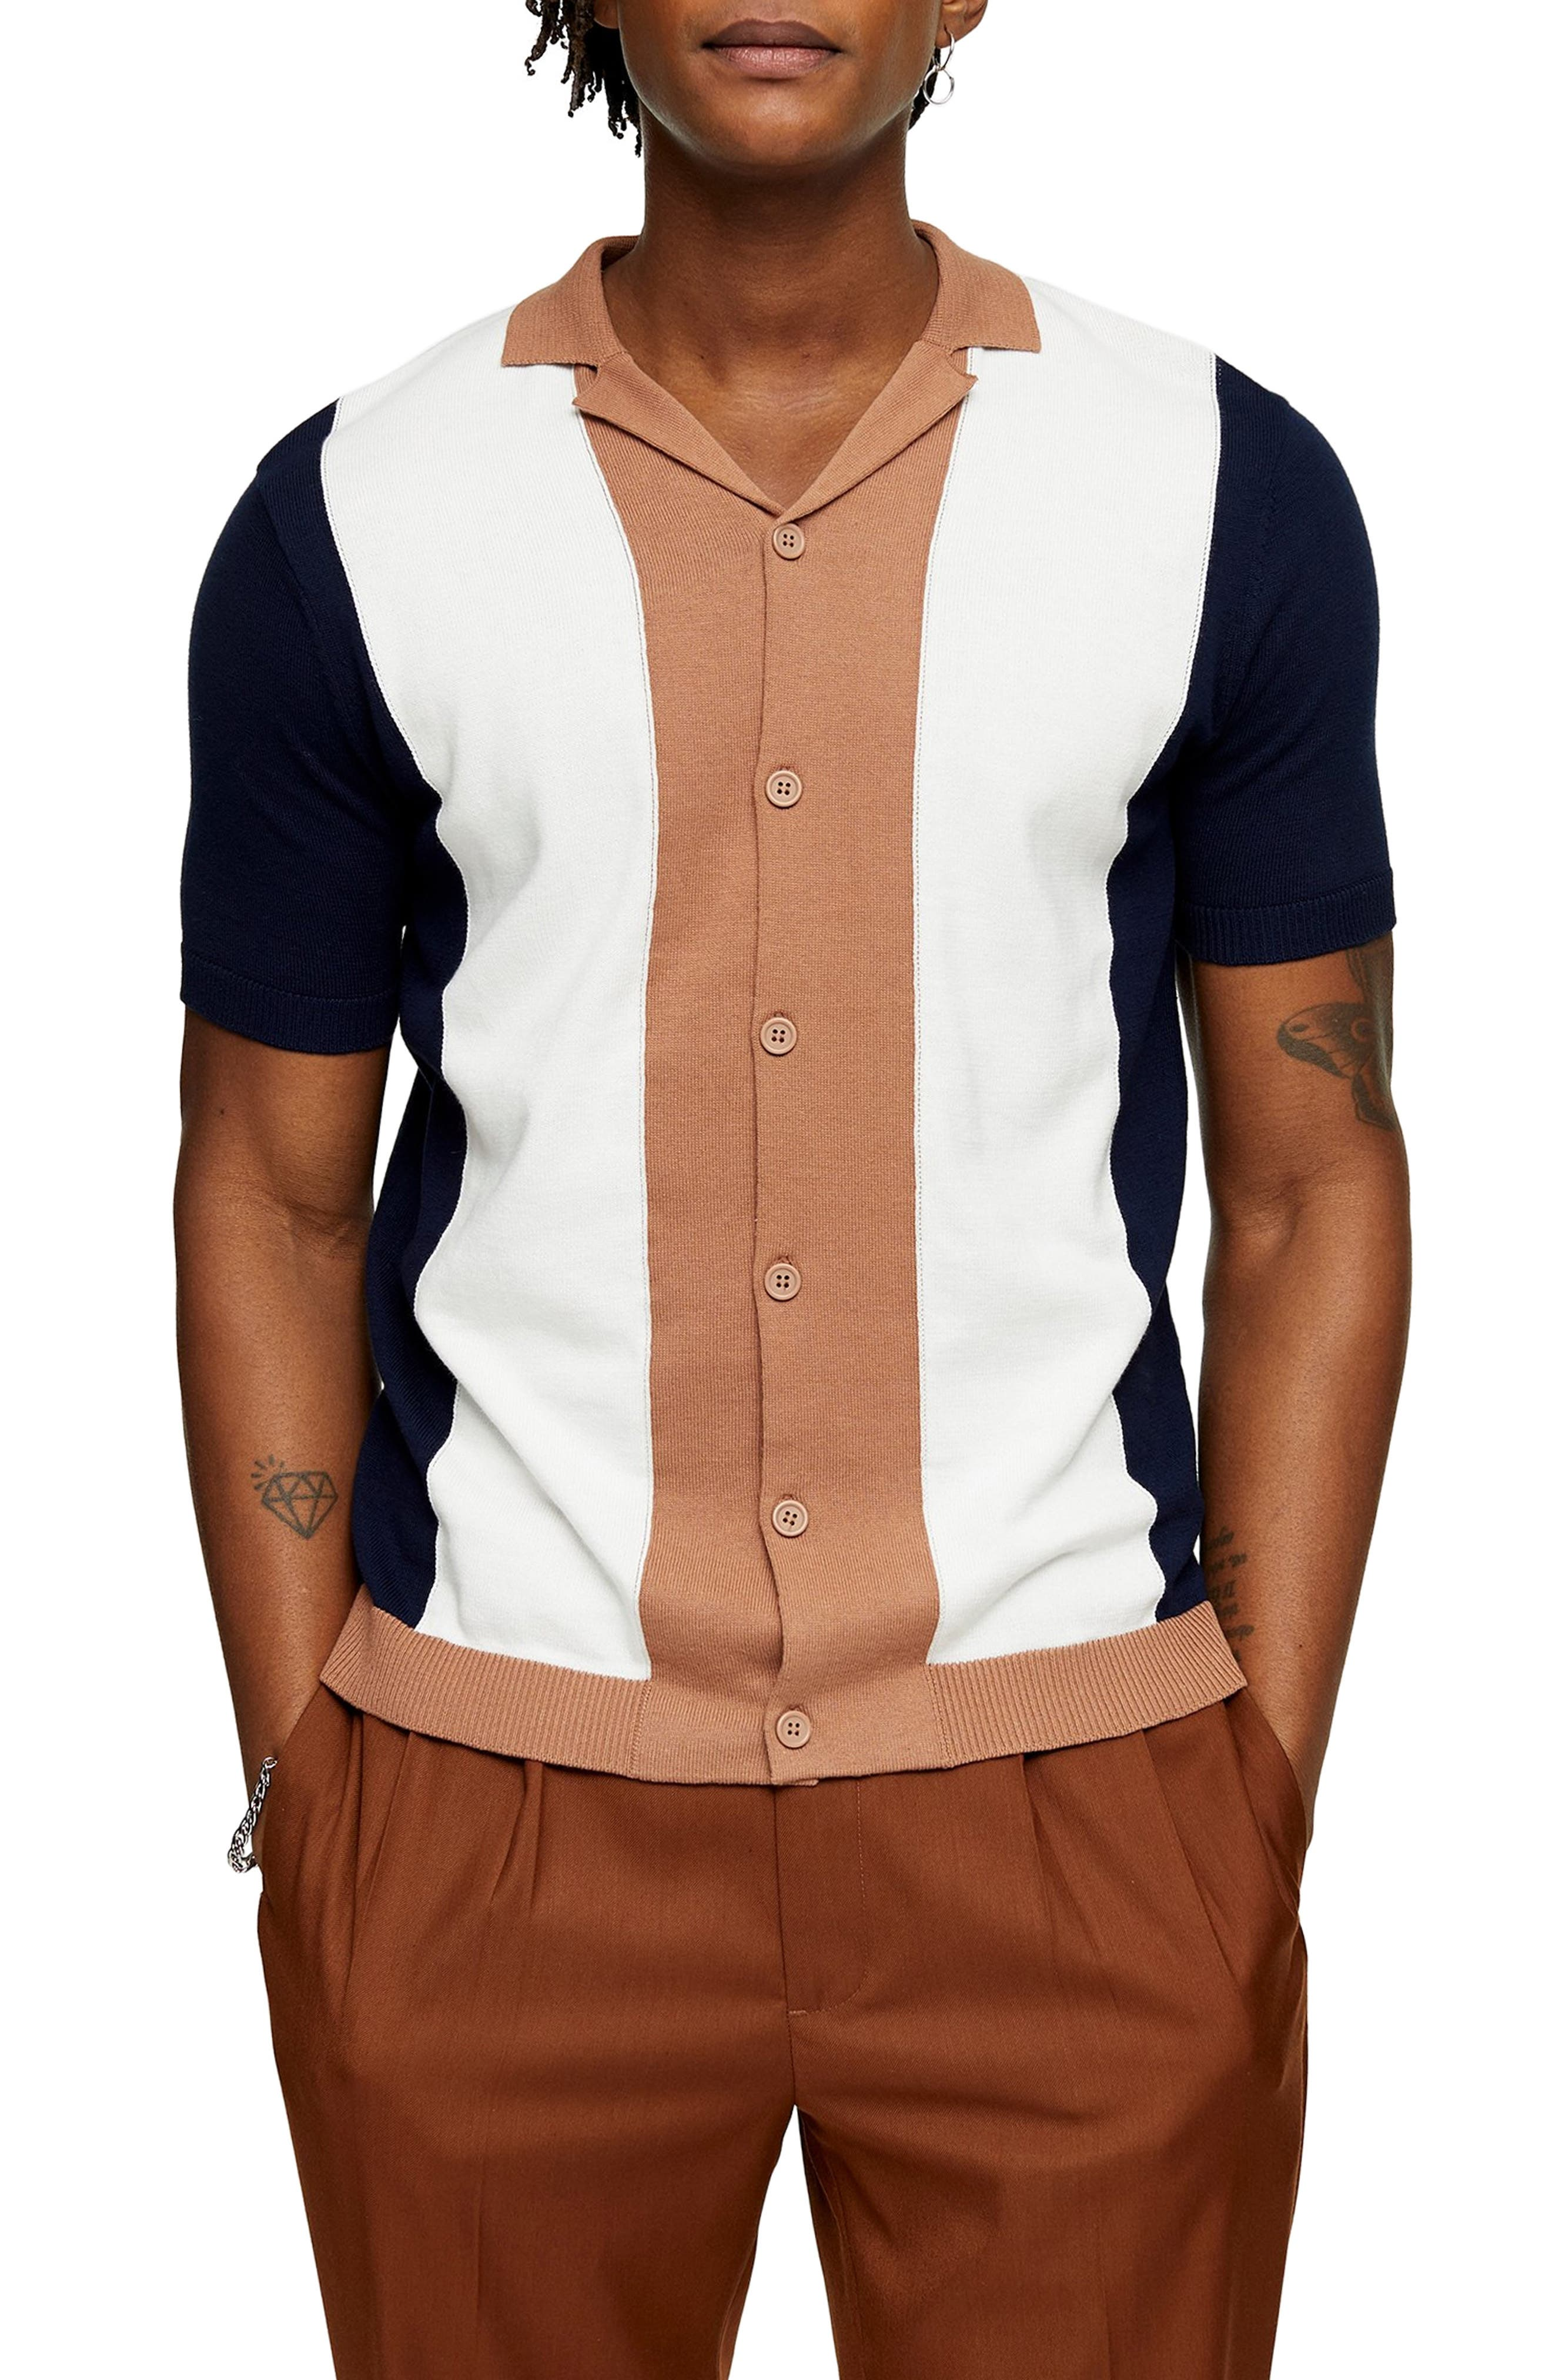 Vintage Mens Clothing | Retro Clothing for Men Mens Topman Classic Fit Colorblock Short Sleeve Cardigan $33.49 AT vintagedancer.com